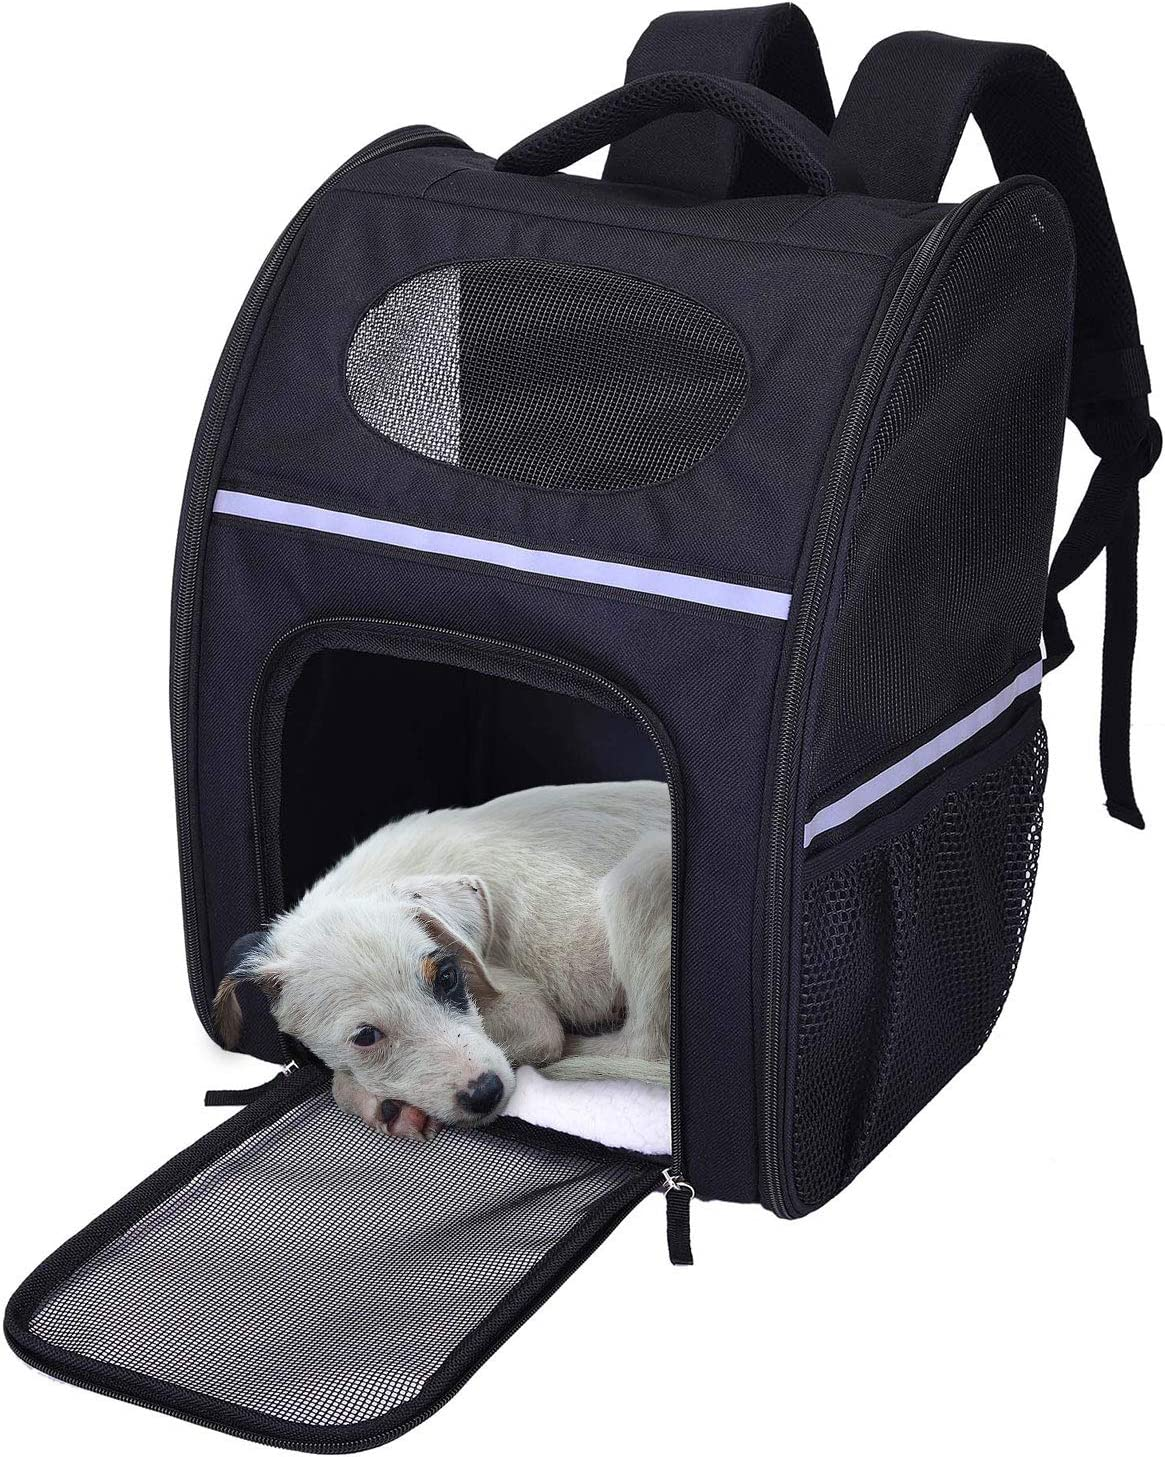 Lampop Mochila para Mascotas Portador de Viaje Bolsa de Transporte para Perros Gatos Malla Transpirable Transportín Jaula Capazos Transportadoras Plegable Viaje Coche Portátil